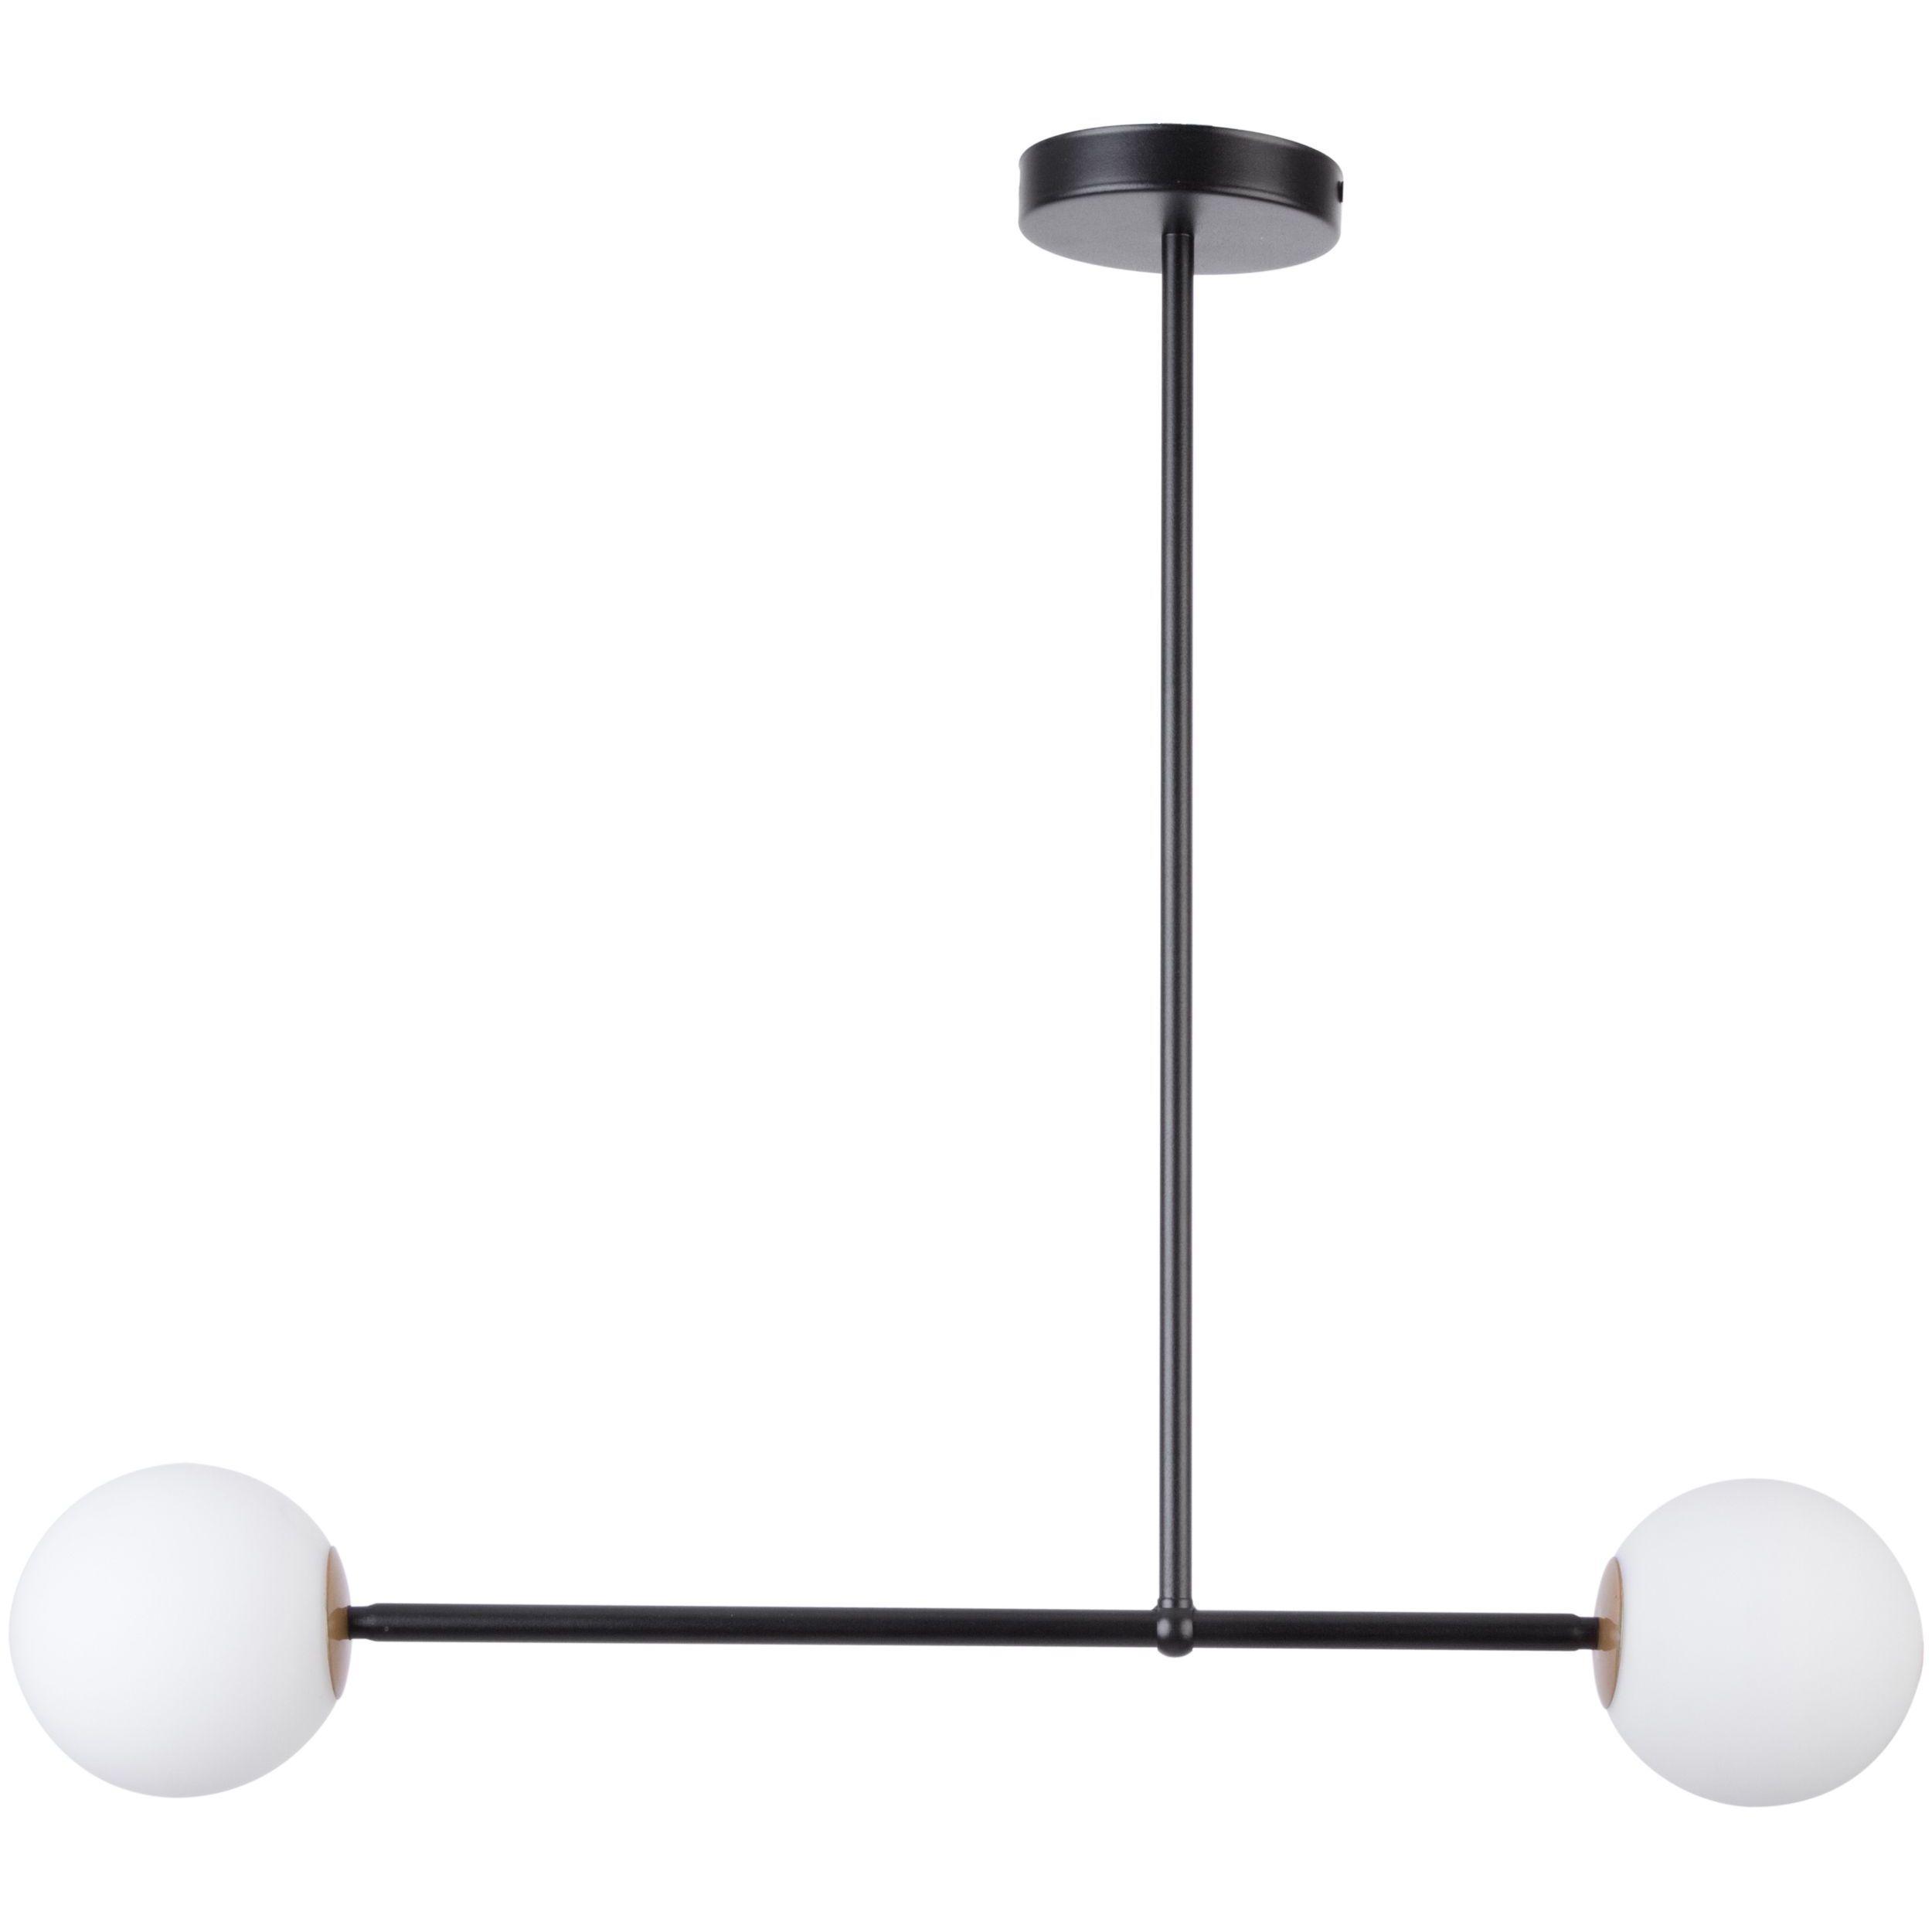 Lampa sufitowa Sigma Gama x2 Czarny